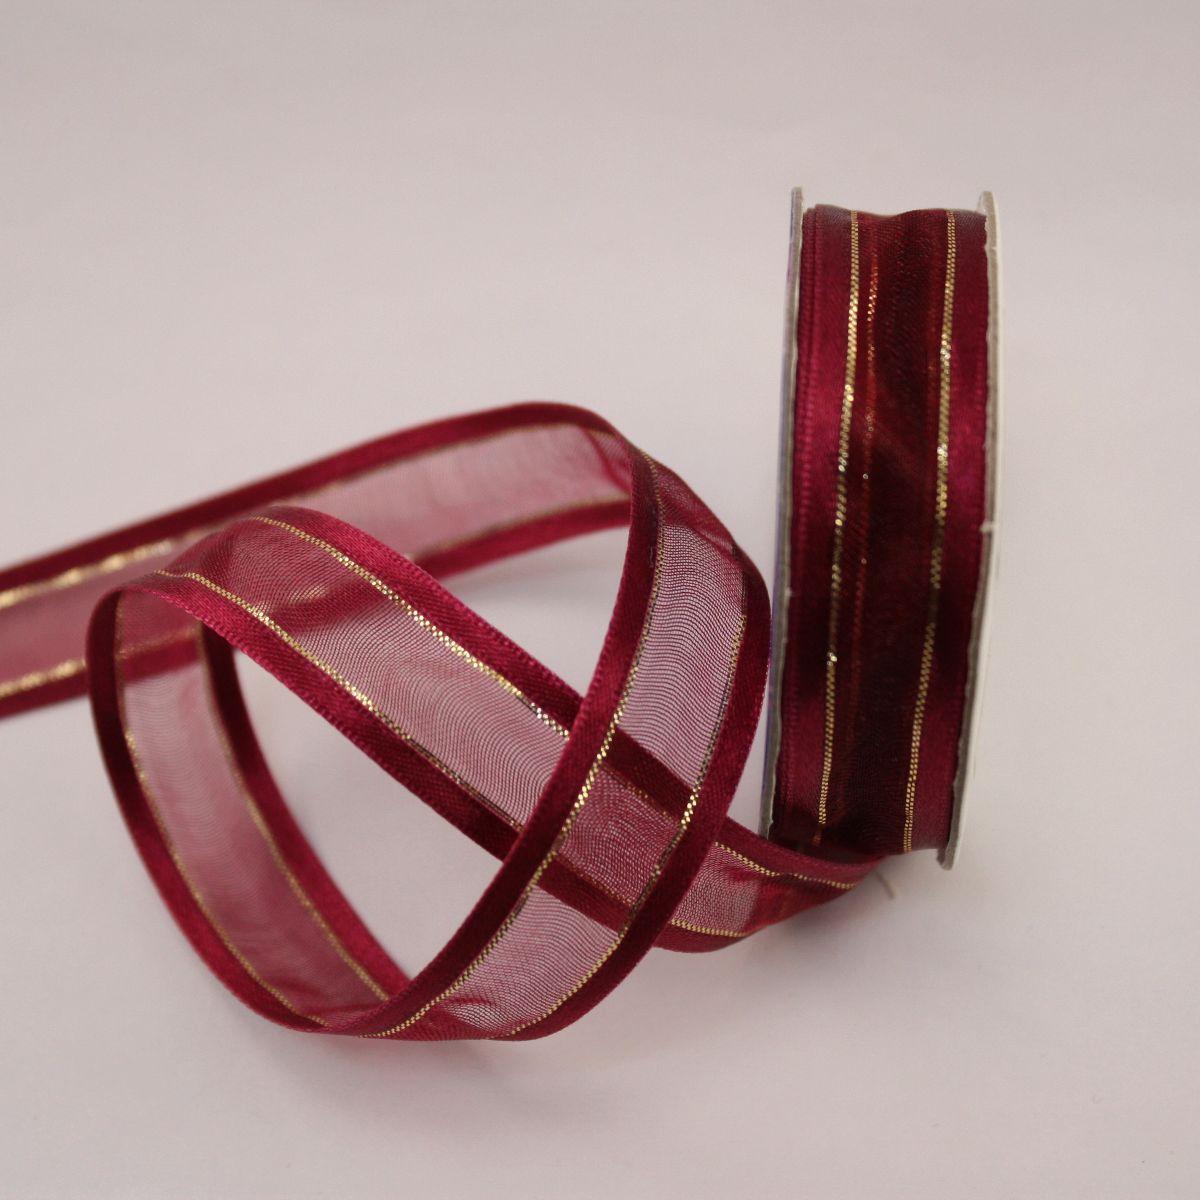 Ruban fantaisie en bobine bordeaux 15 mm